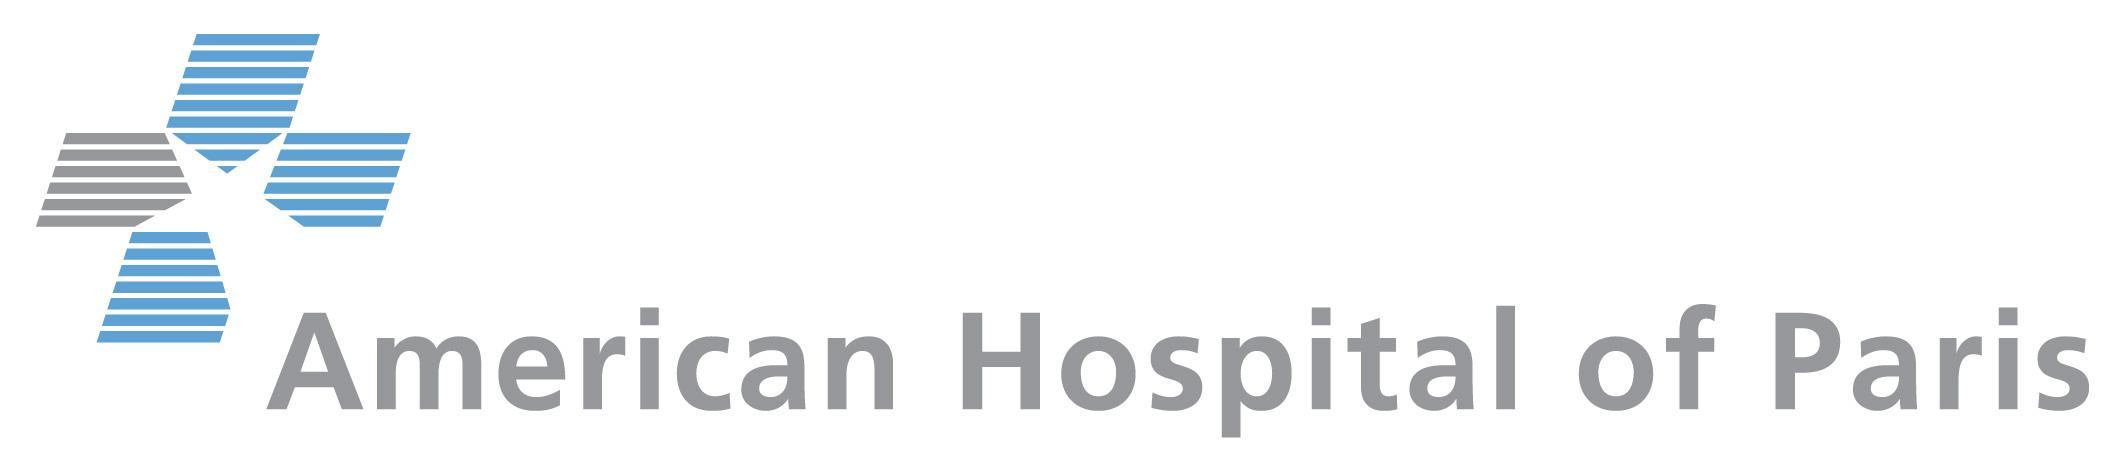 Logo Hôpital américain